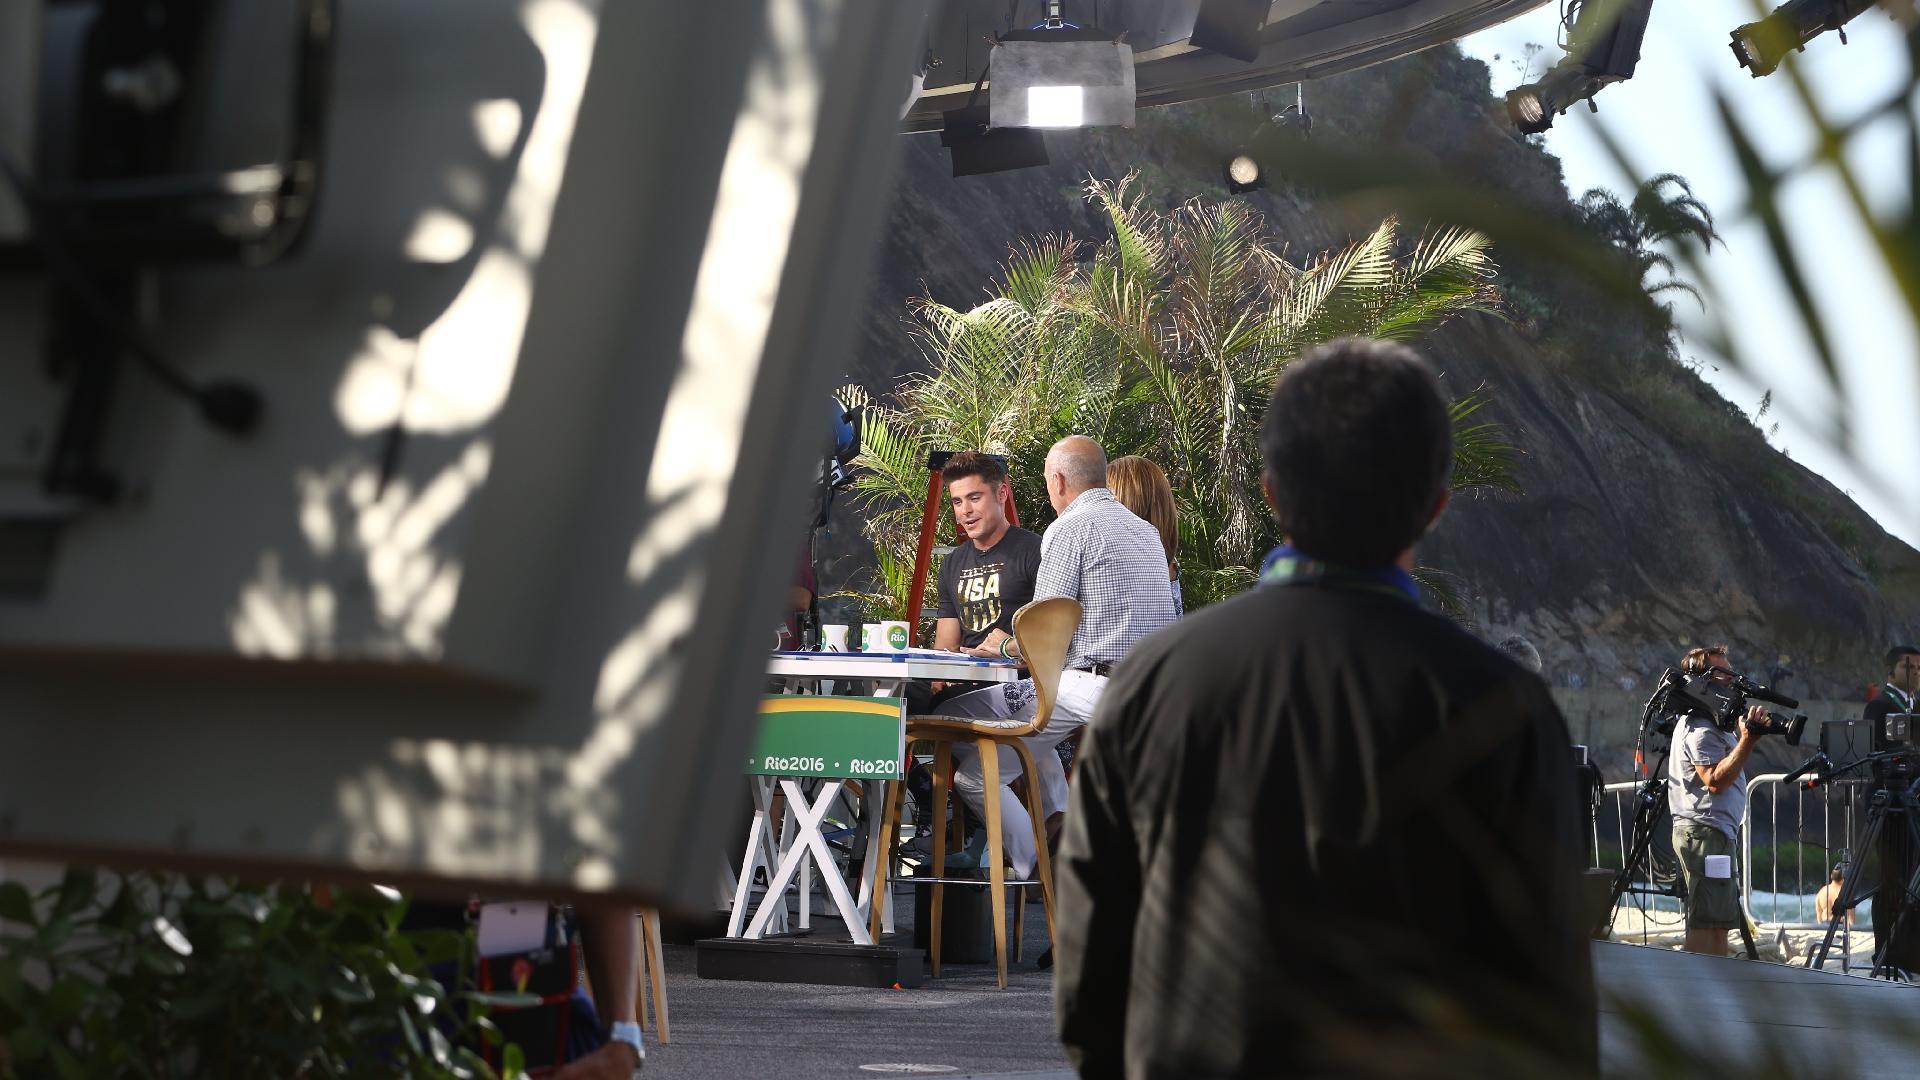 Zac Efron esteve no Rio de Janeiro durante os Jogos Olímpicos